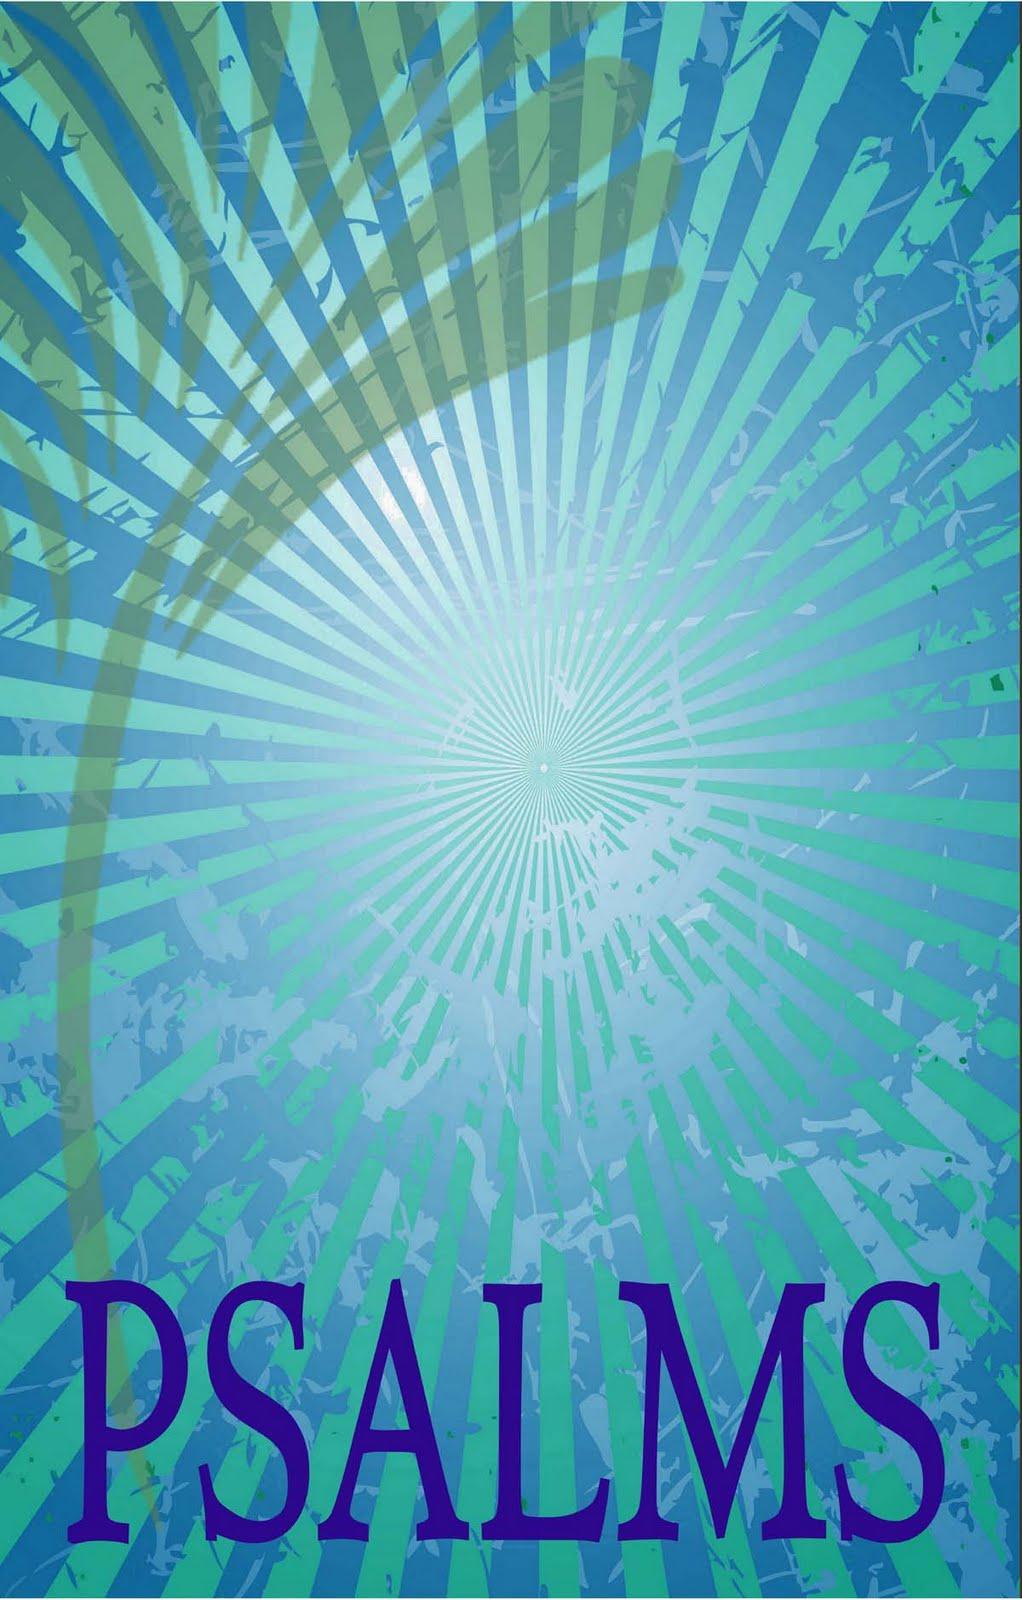 nikos  upcoming book of psalms sermon series reflections